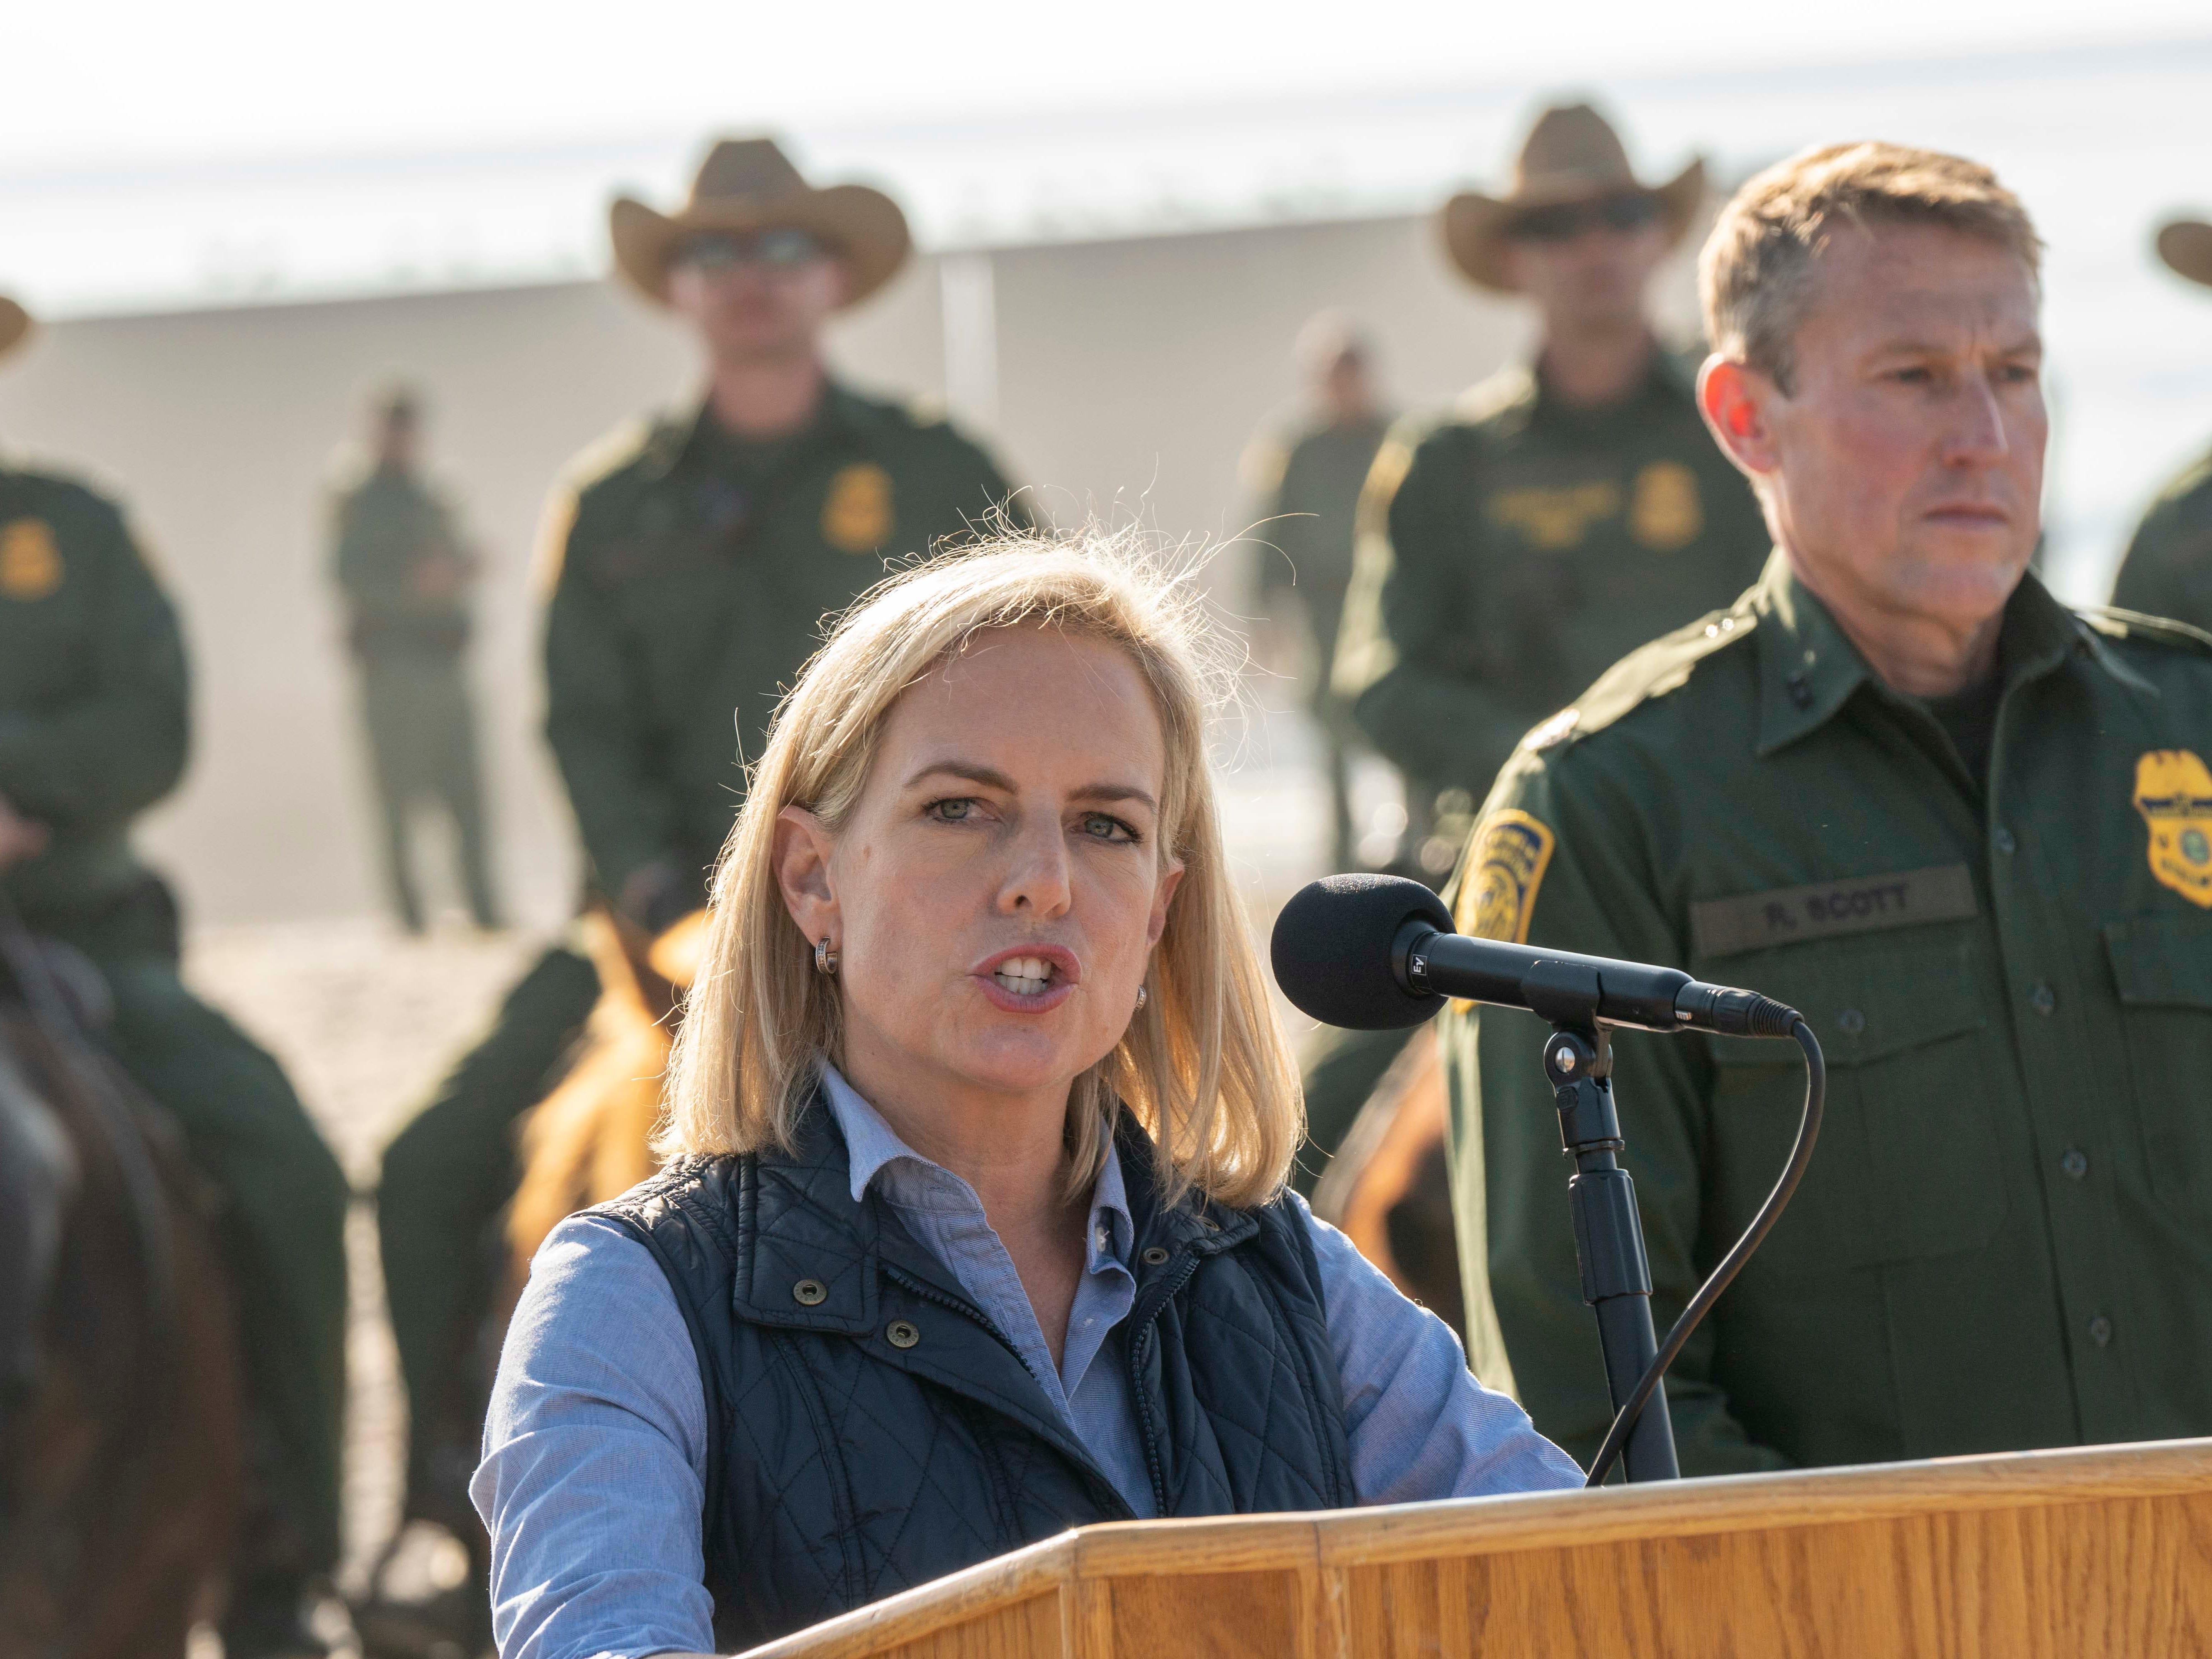 Department of Homeland Security Secretary Kirstjen Nielsen visits the border in San Diego on Nov. 20, 2018.